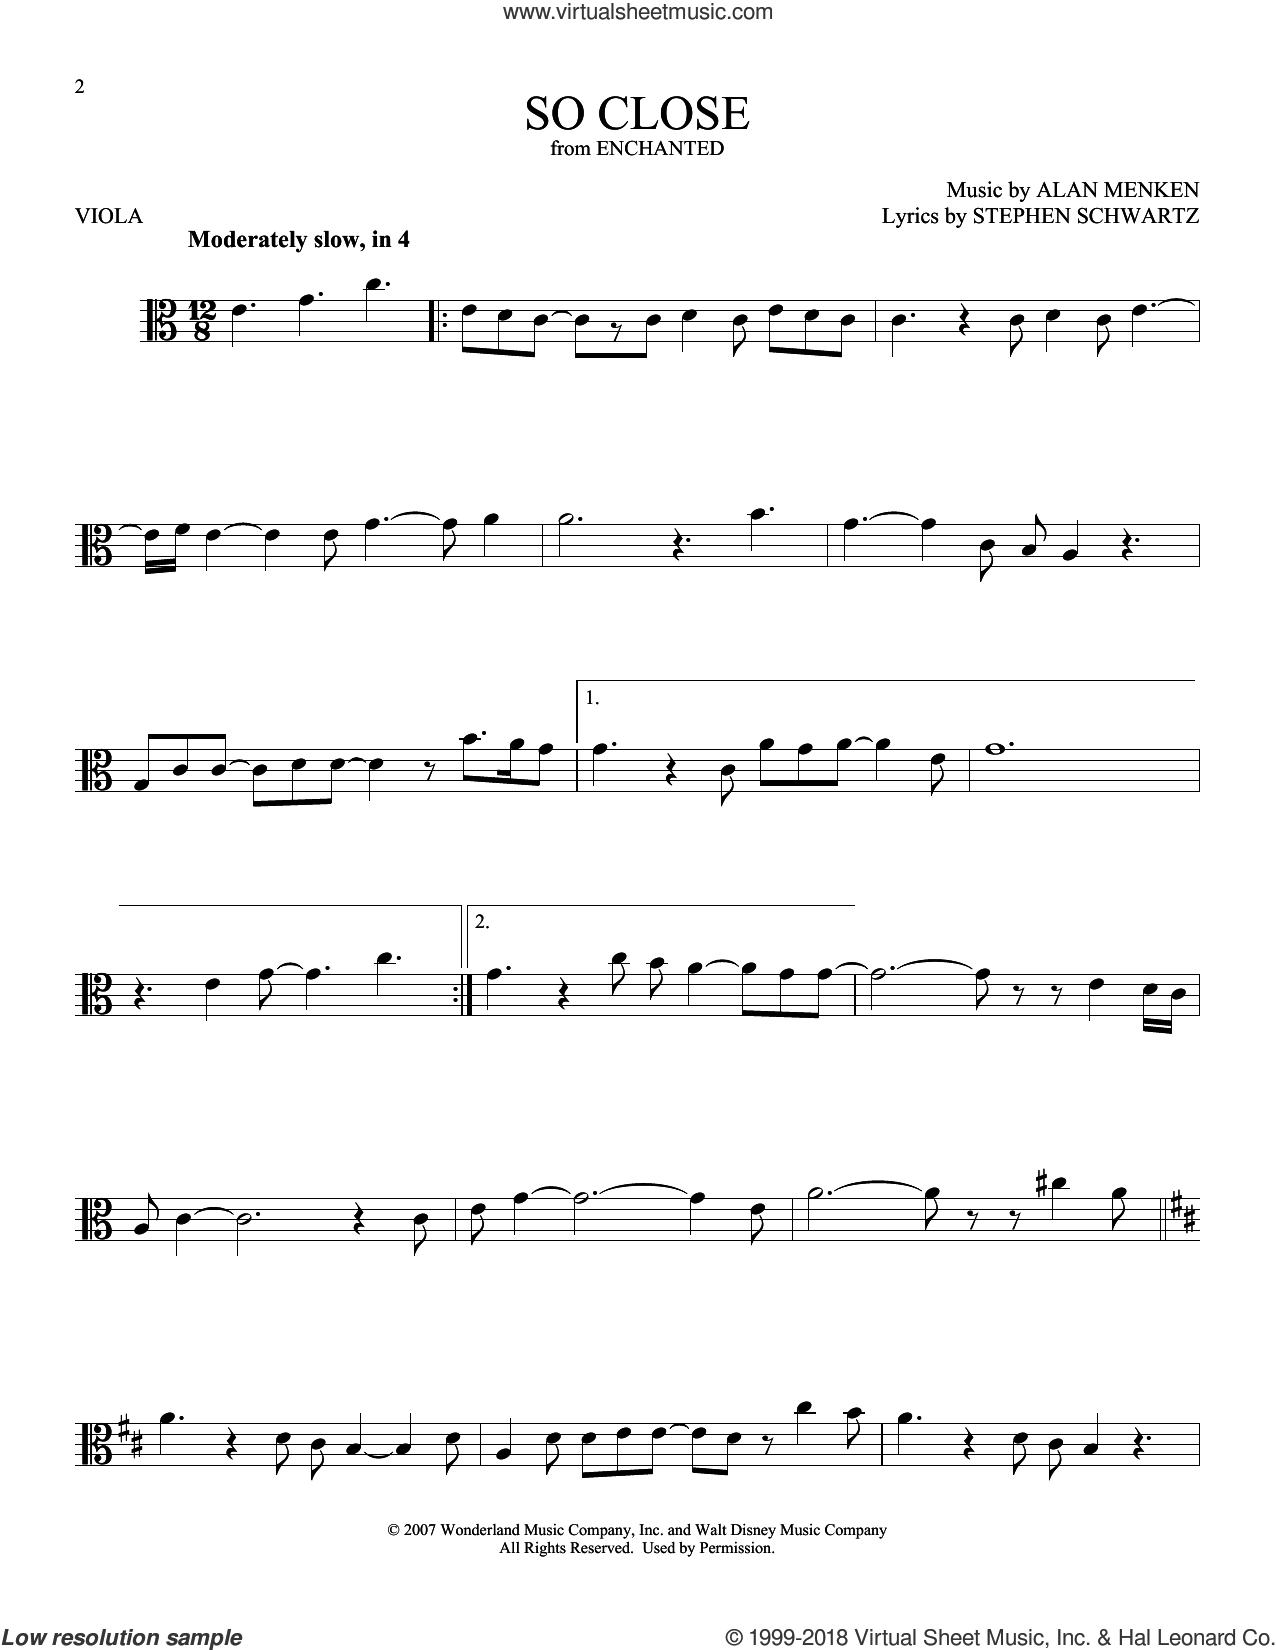 So Close sheet music for viola solo by Alan Menken and Stephen Schwartz, intermediate skill level